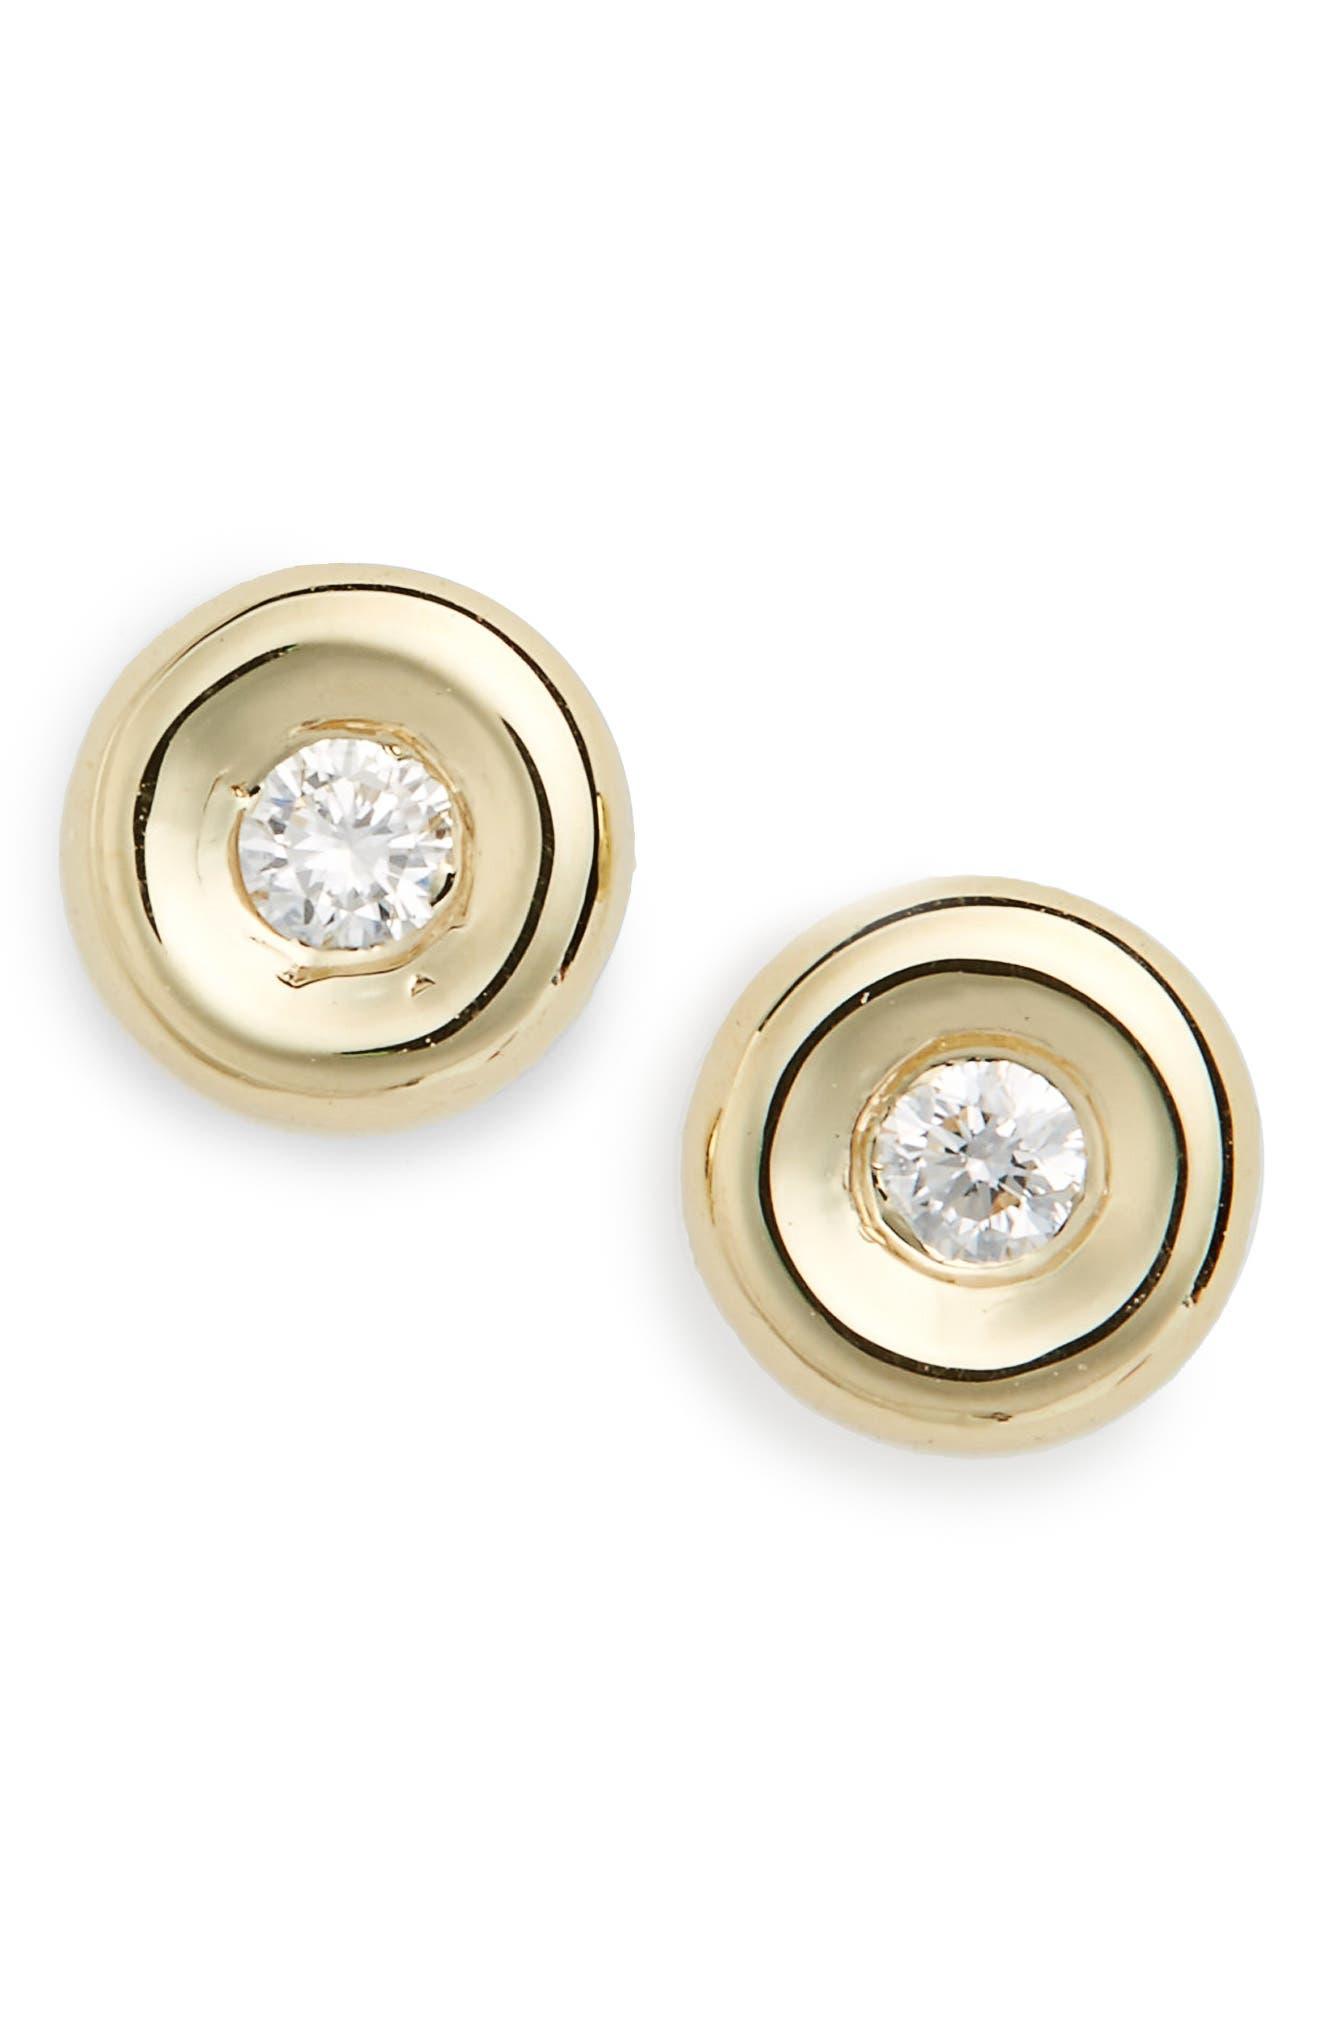 Tiny Treasures Diamond Stud Earrings,                         Main,                         color, Yellow